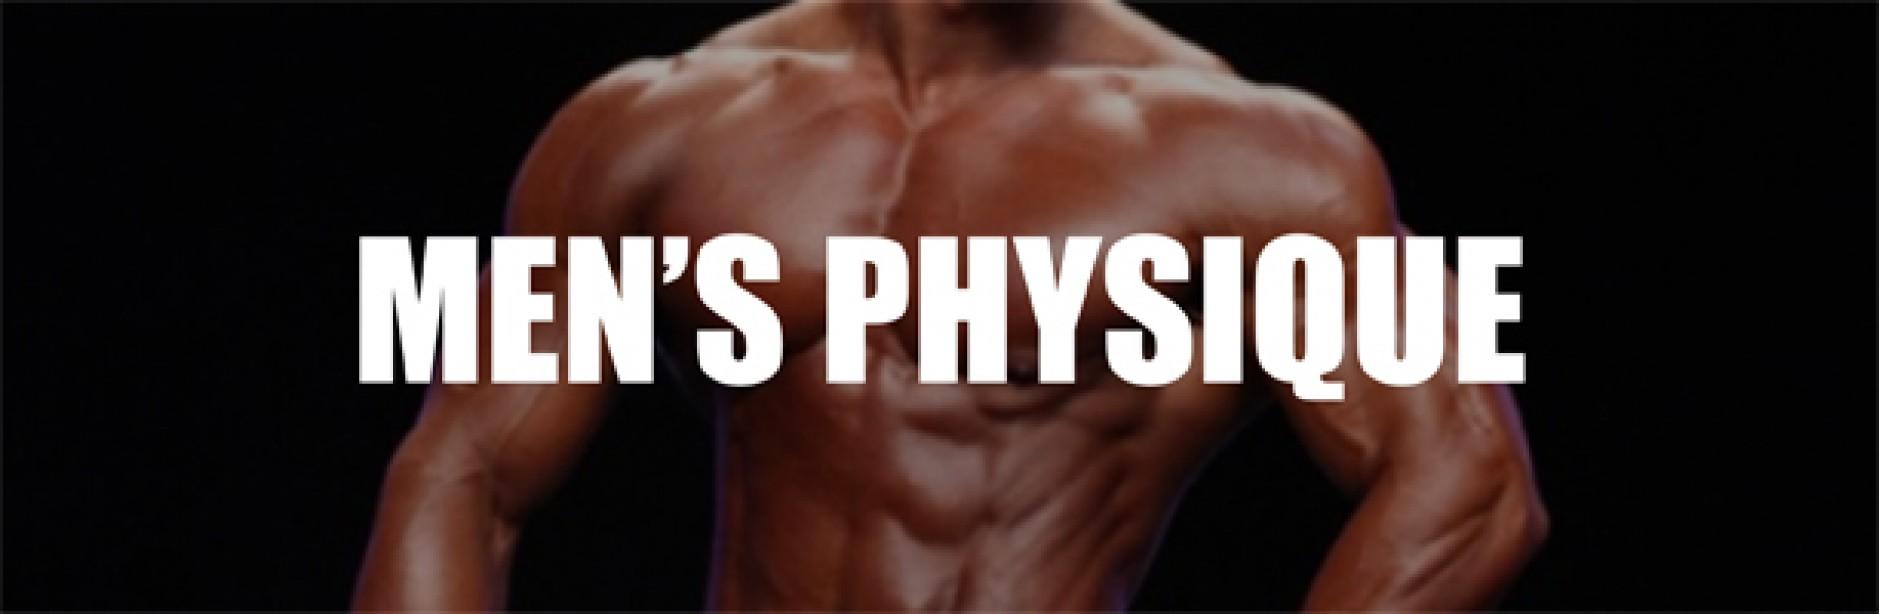 2015 NPC USA Championships Men's Physique Call Out Report